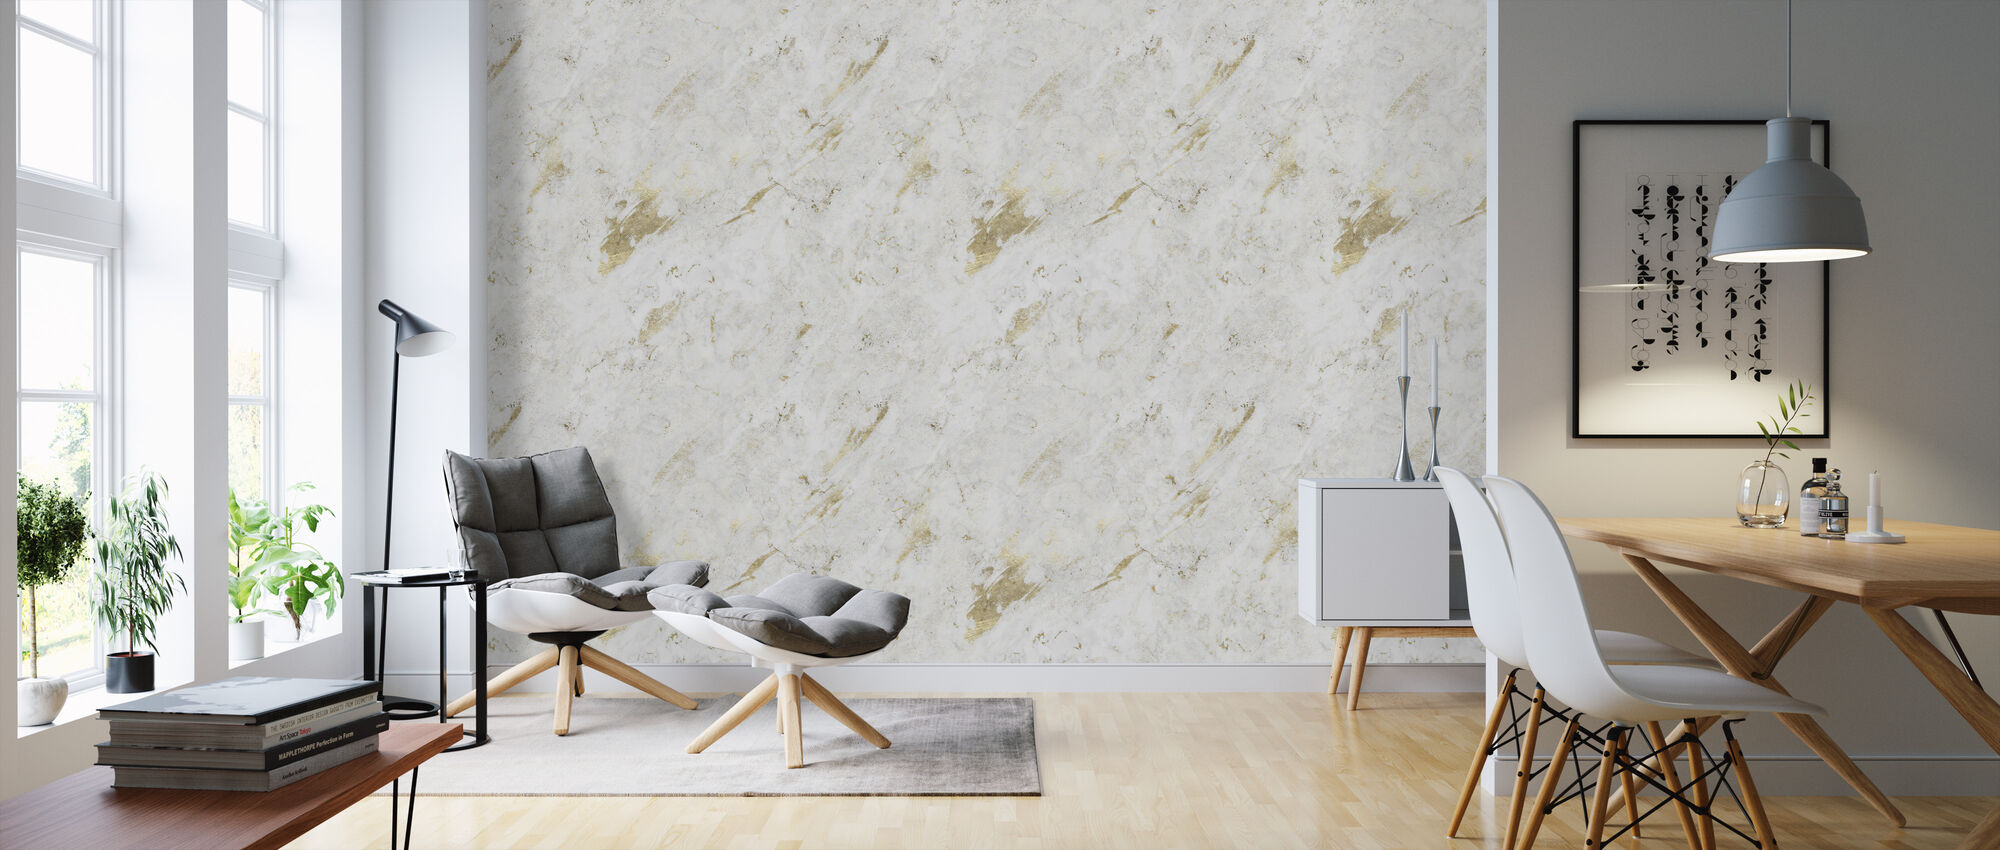 Marble Mandala Supreme - Wallpaper - Living Room